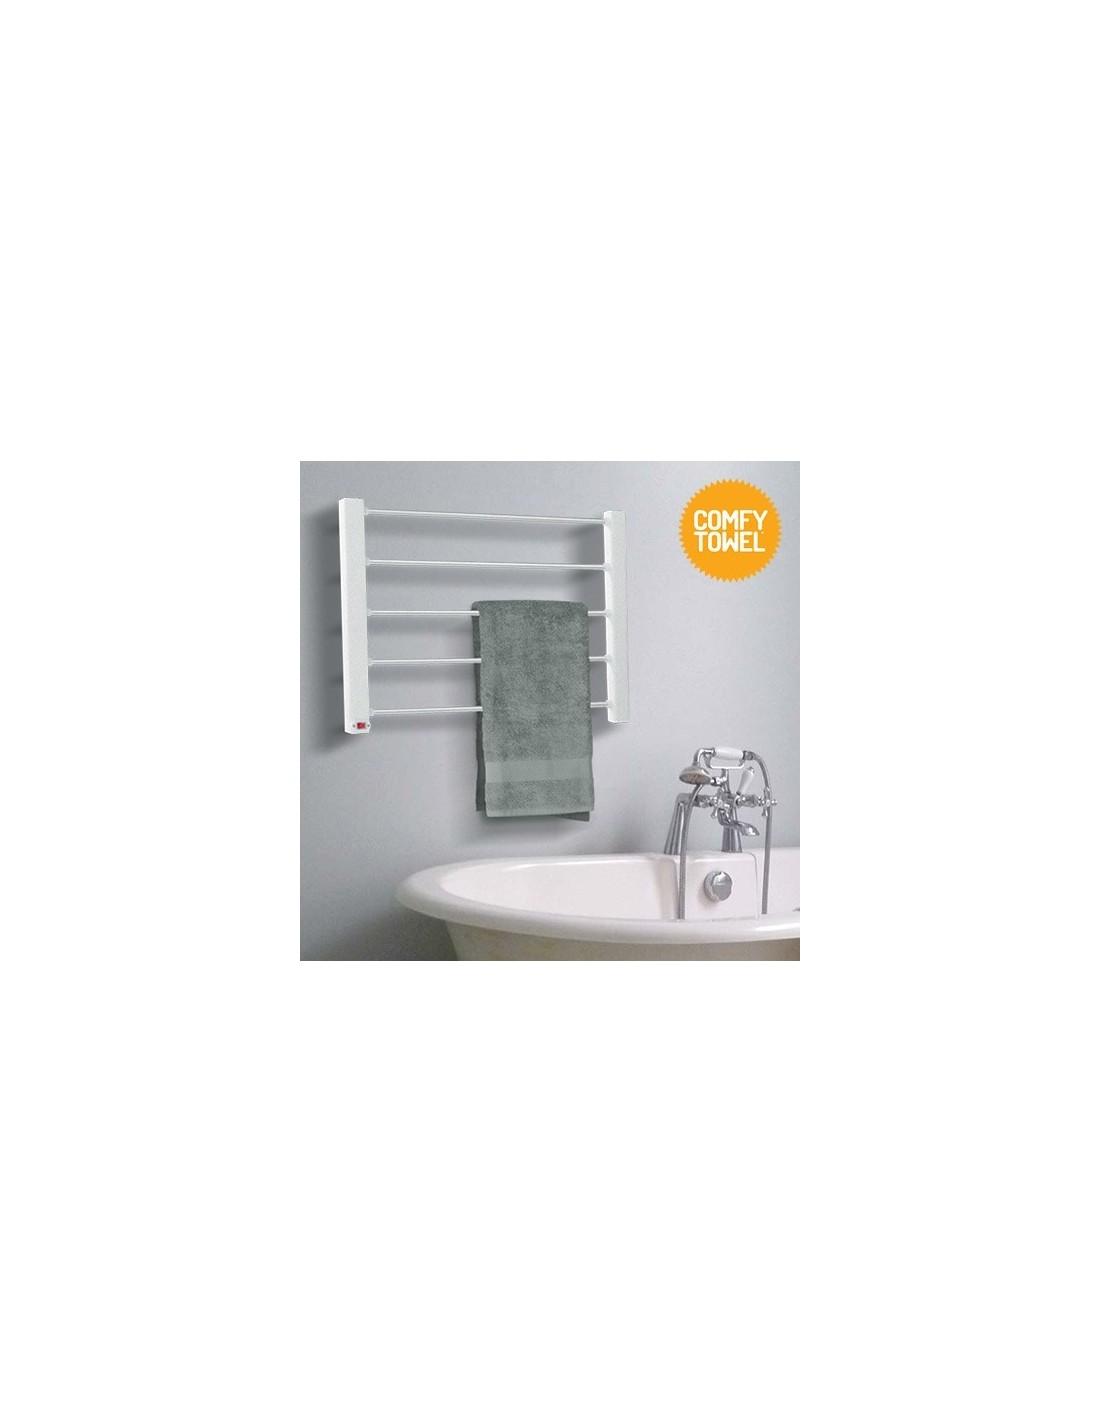 secador de toalhas electrico. Black Bedroom Furniture Sets. Home Design Ideas